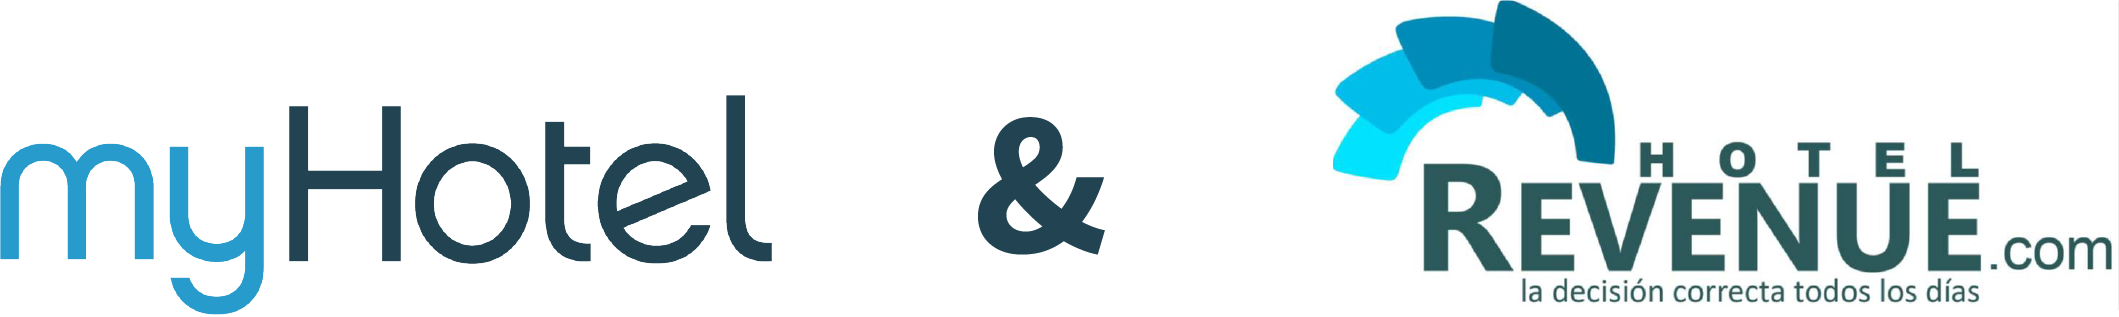 logos@4x